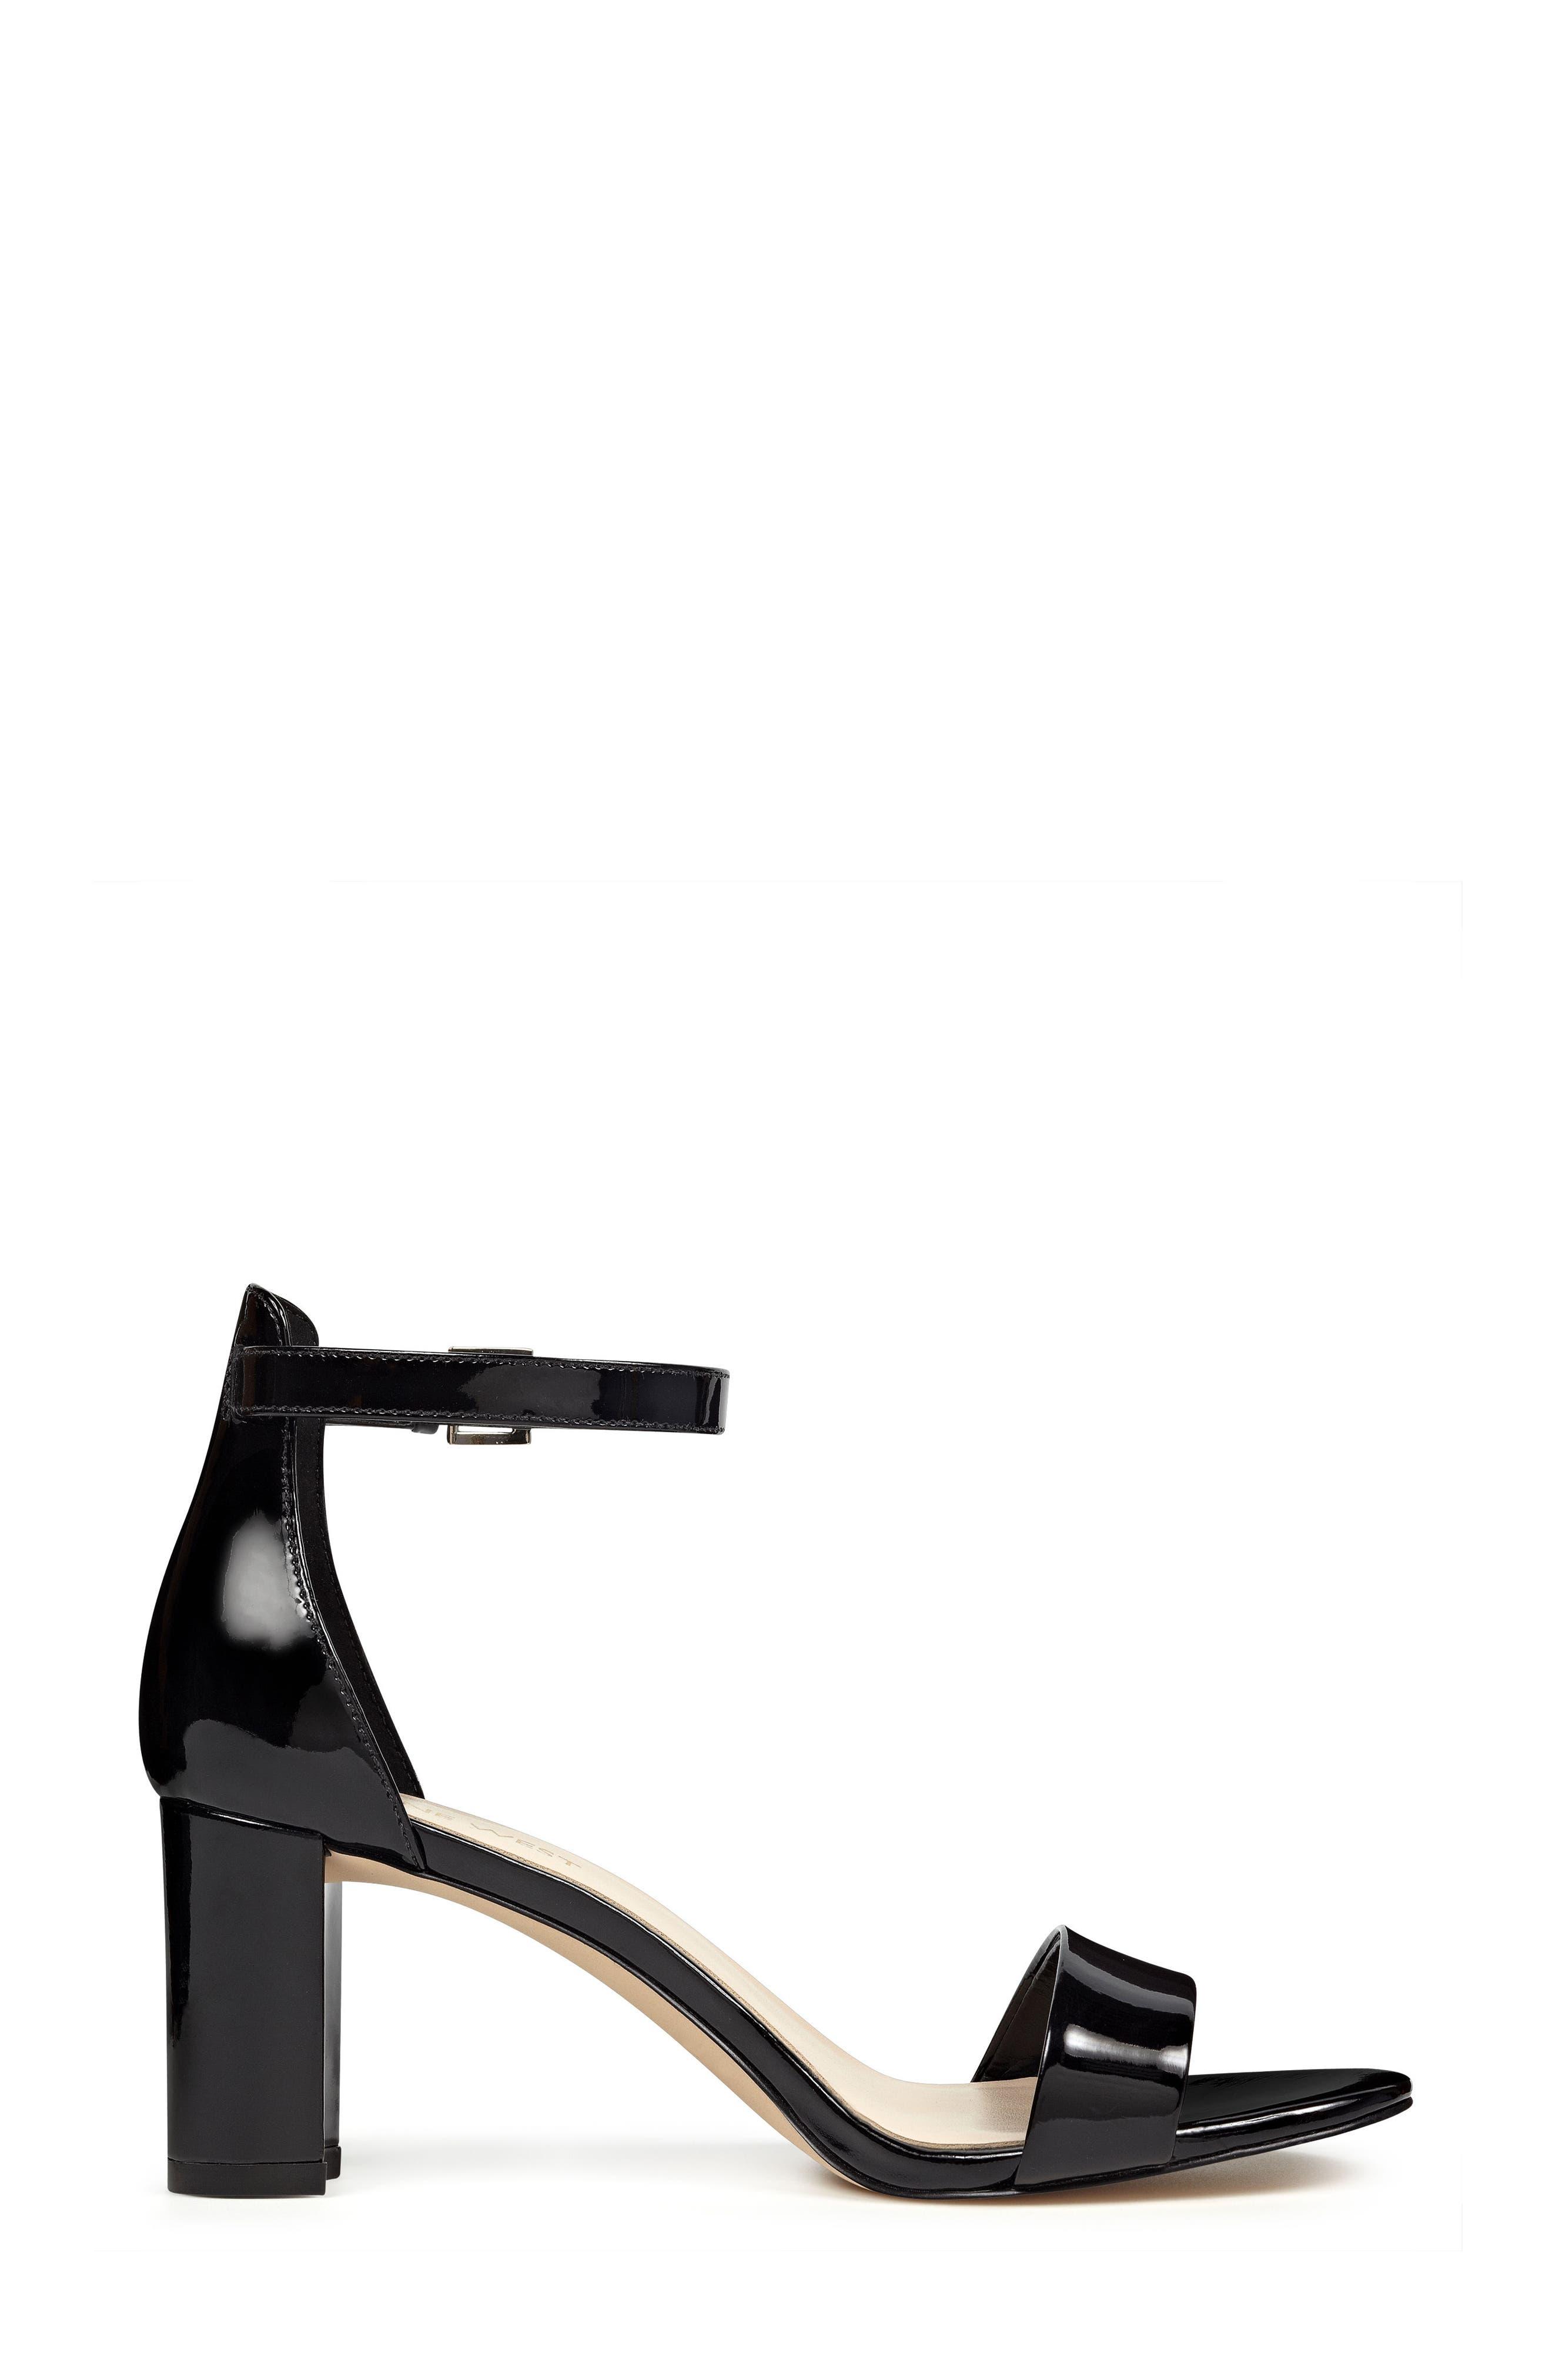 NINE WEST, Pruce Ankle Strap Sandal, Alternate thumbnail 3, color, BLACK PATENT